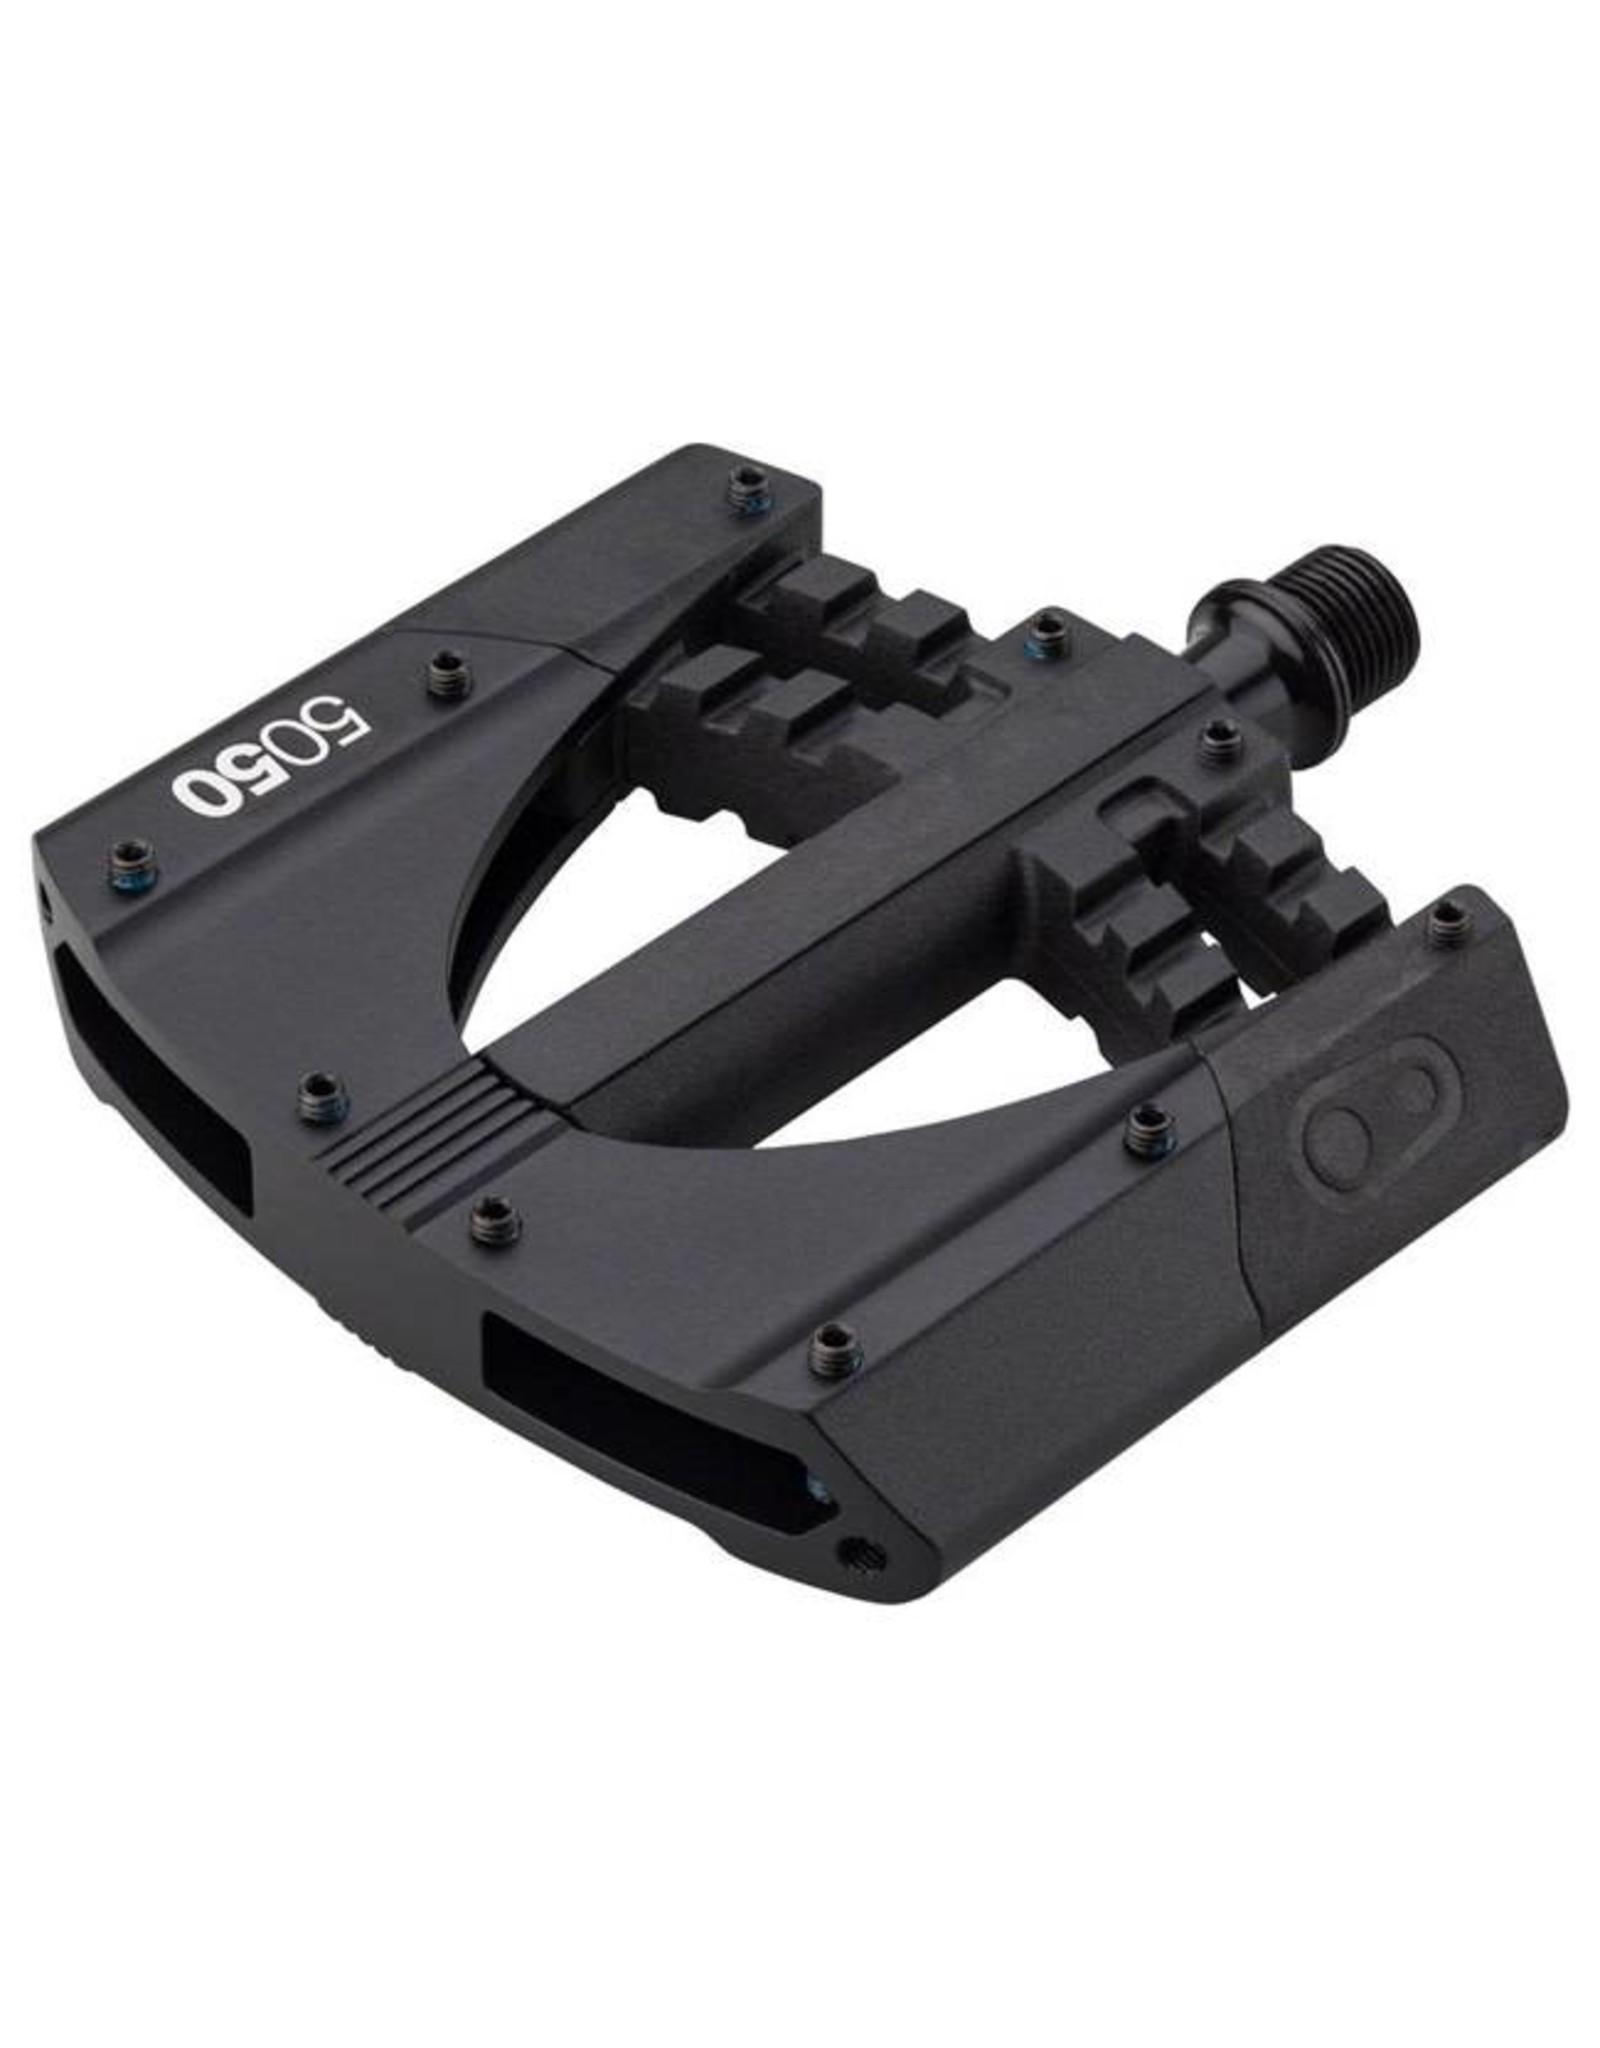 Crank Brothers Crank Brothers 5050 2 Pedals: Black